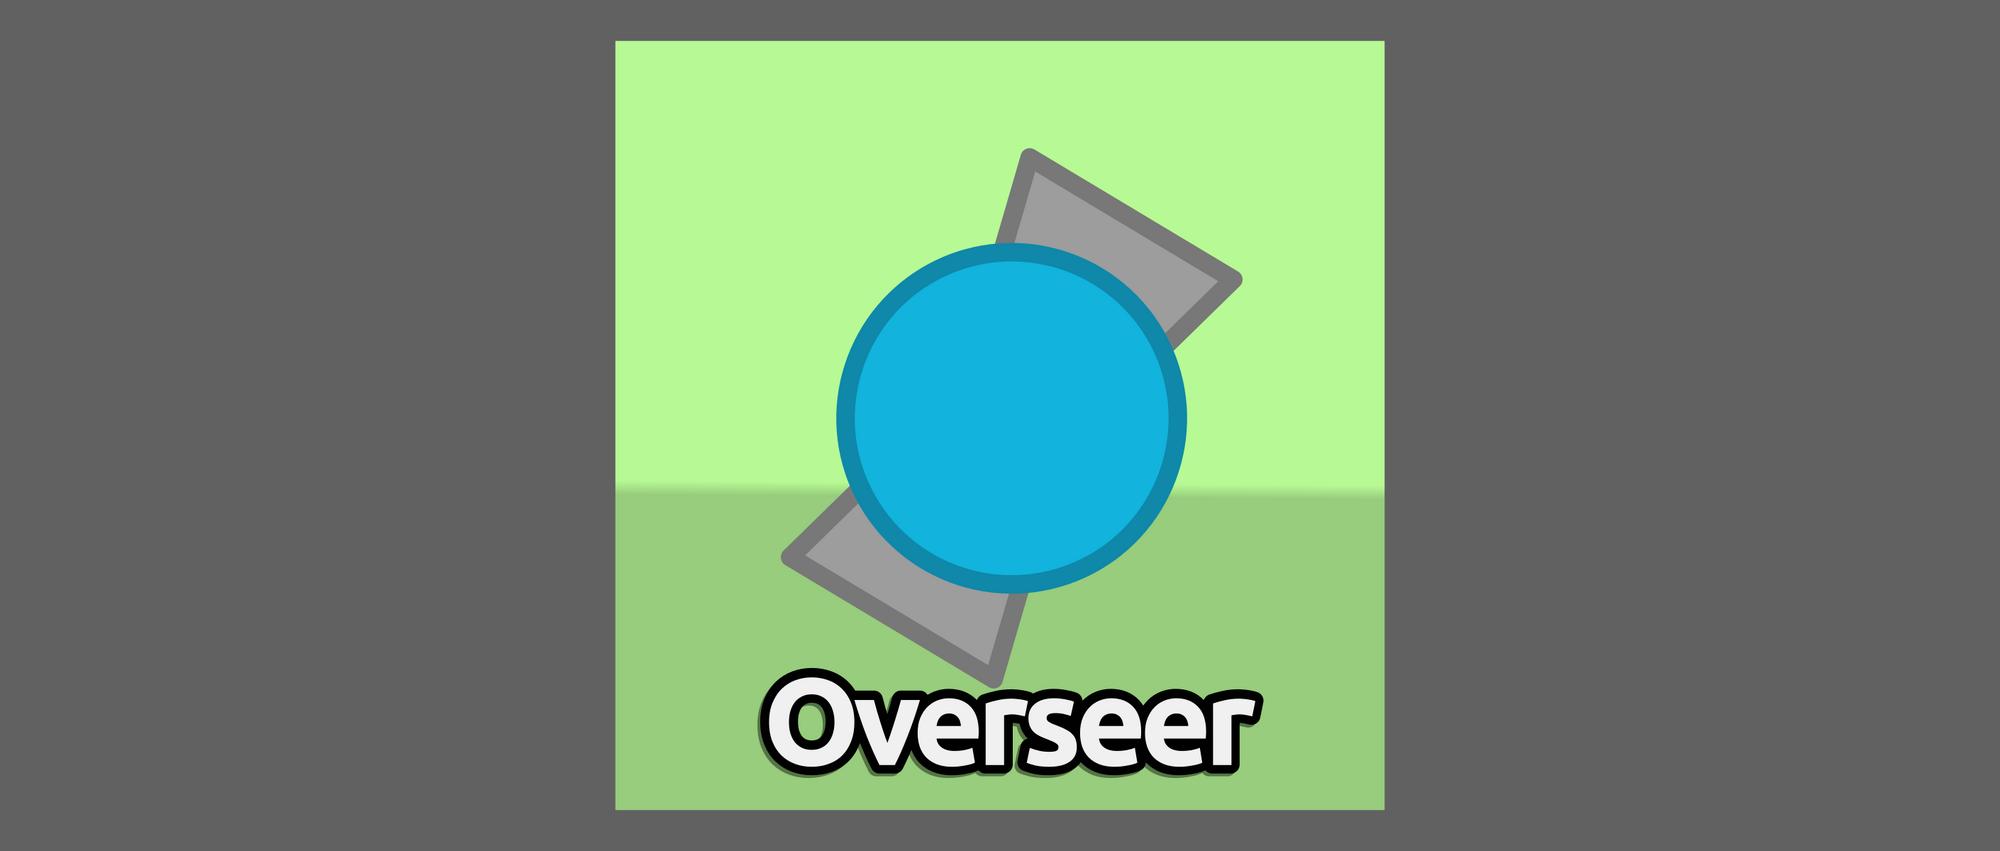 Overseer | Diep io Wiki | FANDOM powered by Wikia